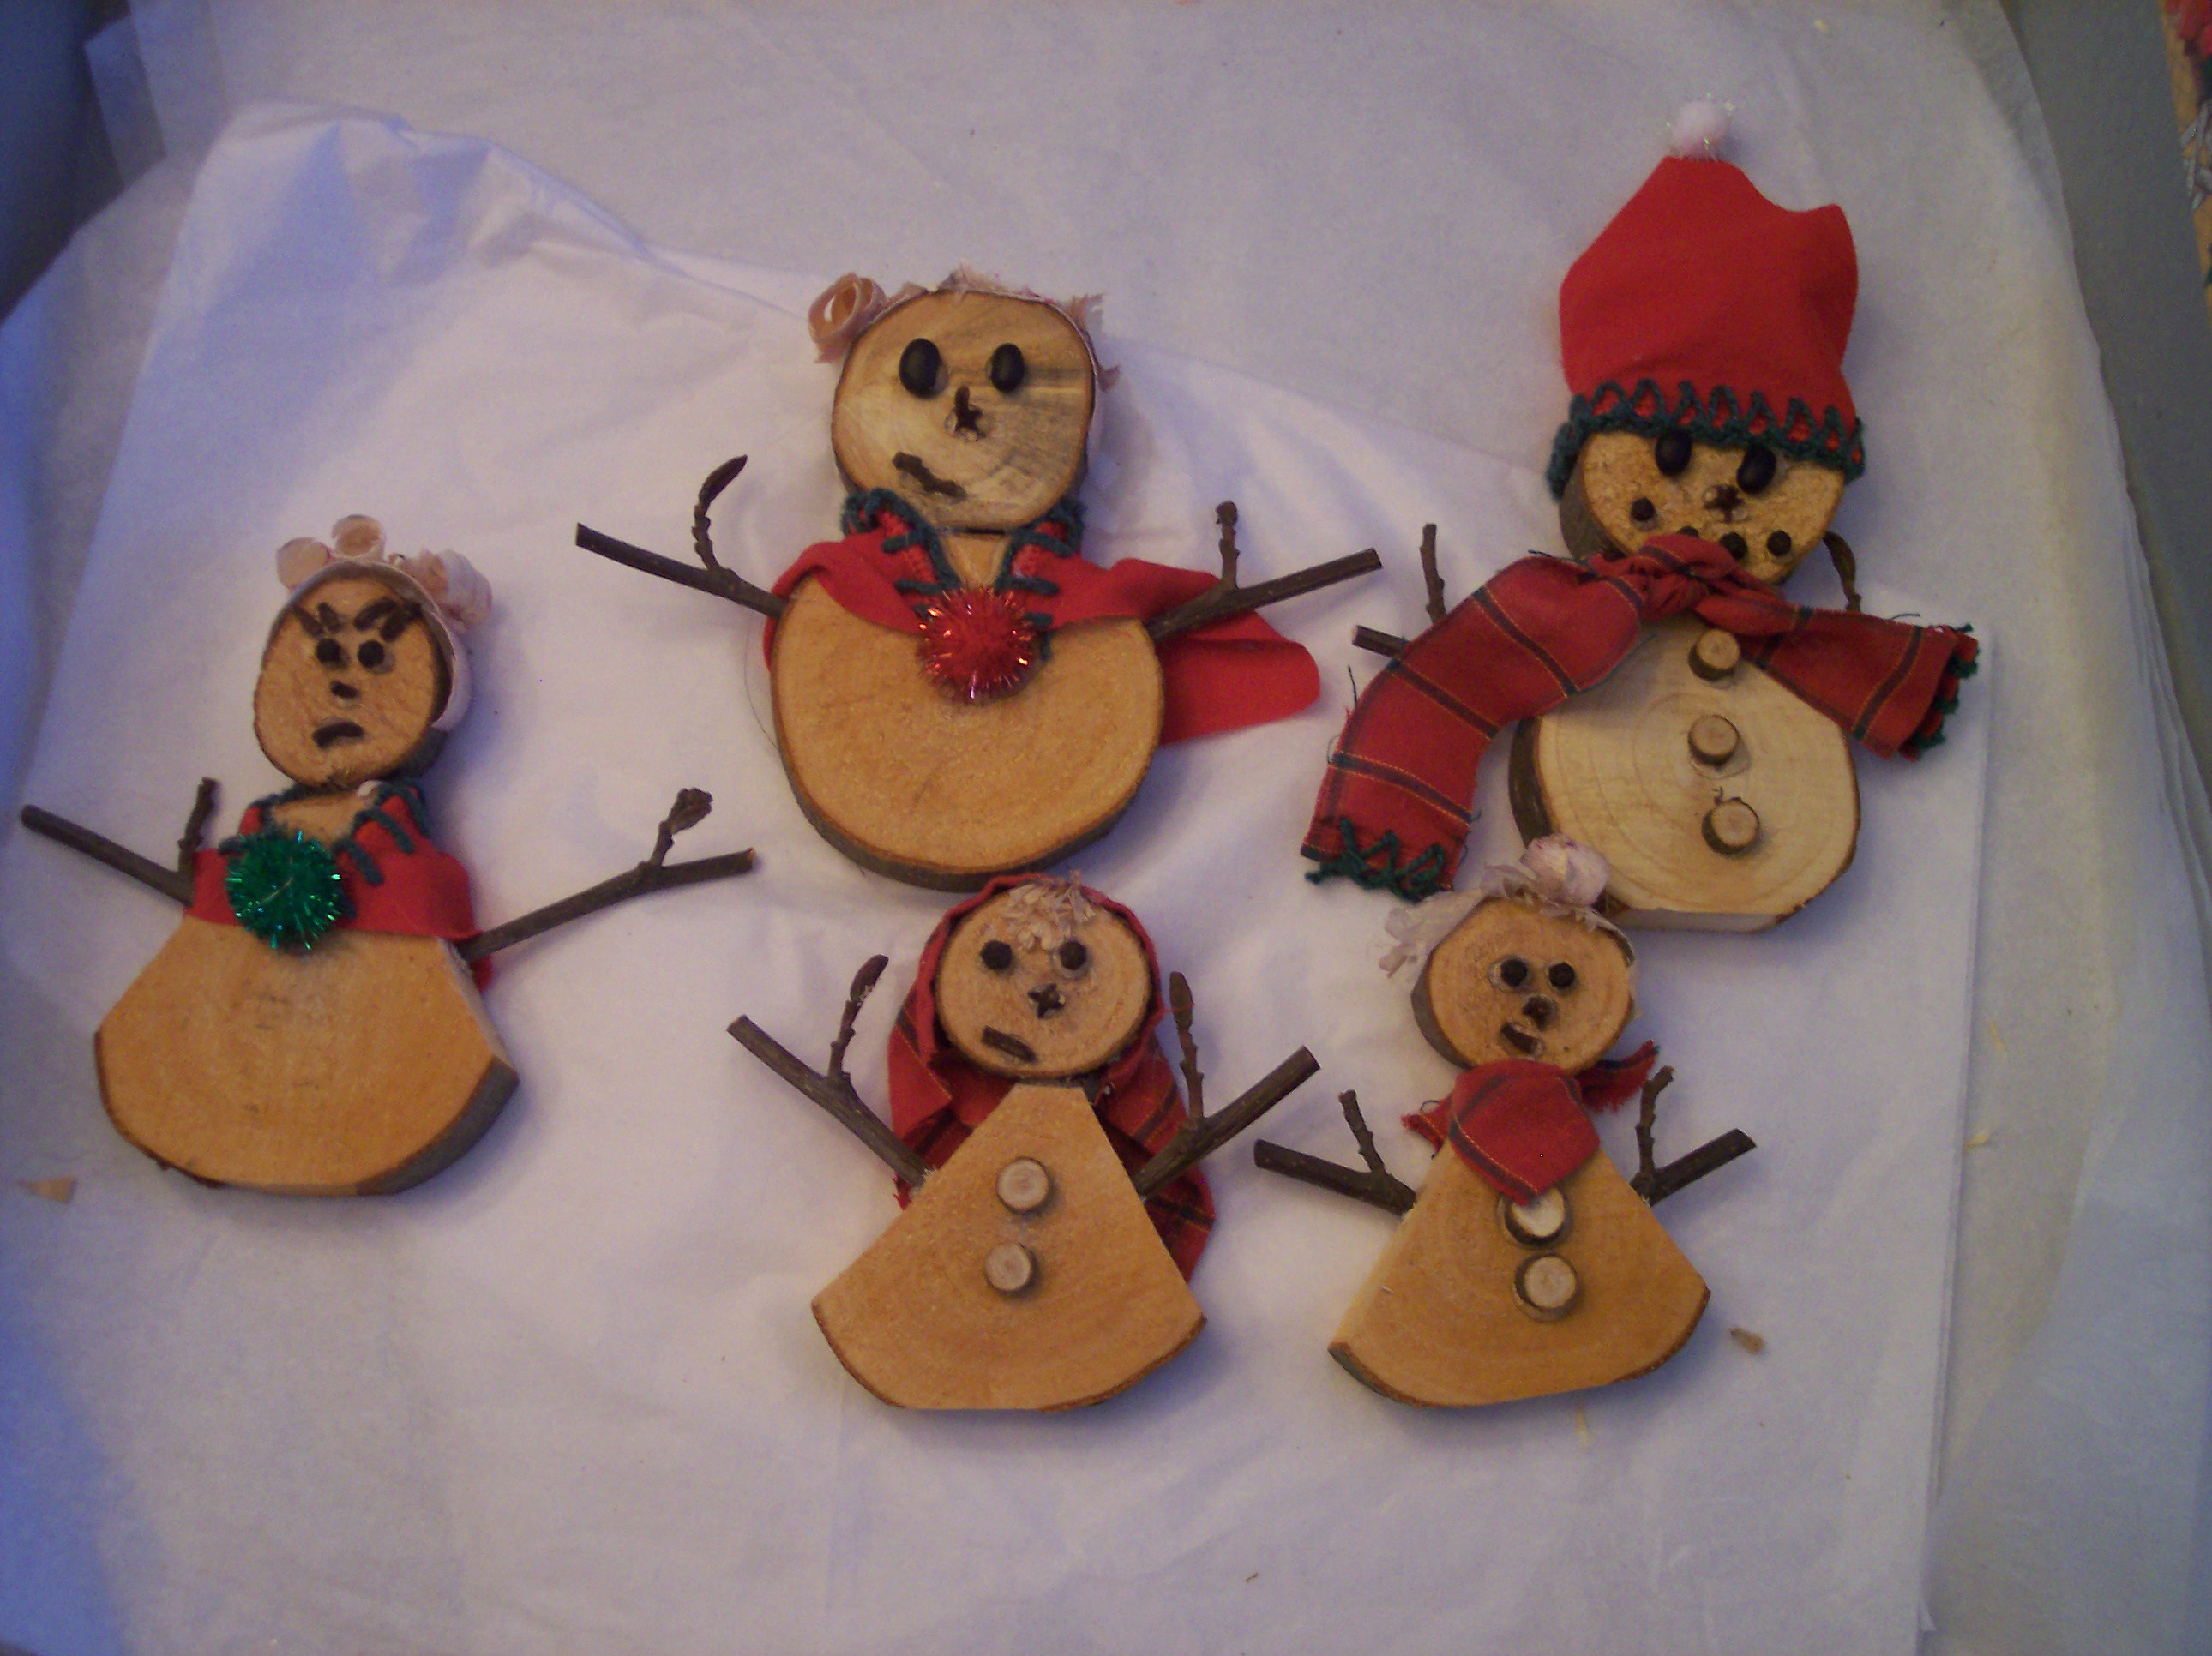 Decorative Wooden Snowman Family.